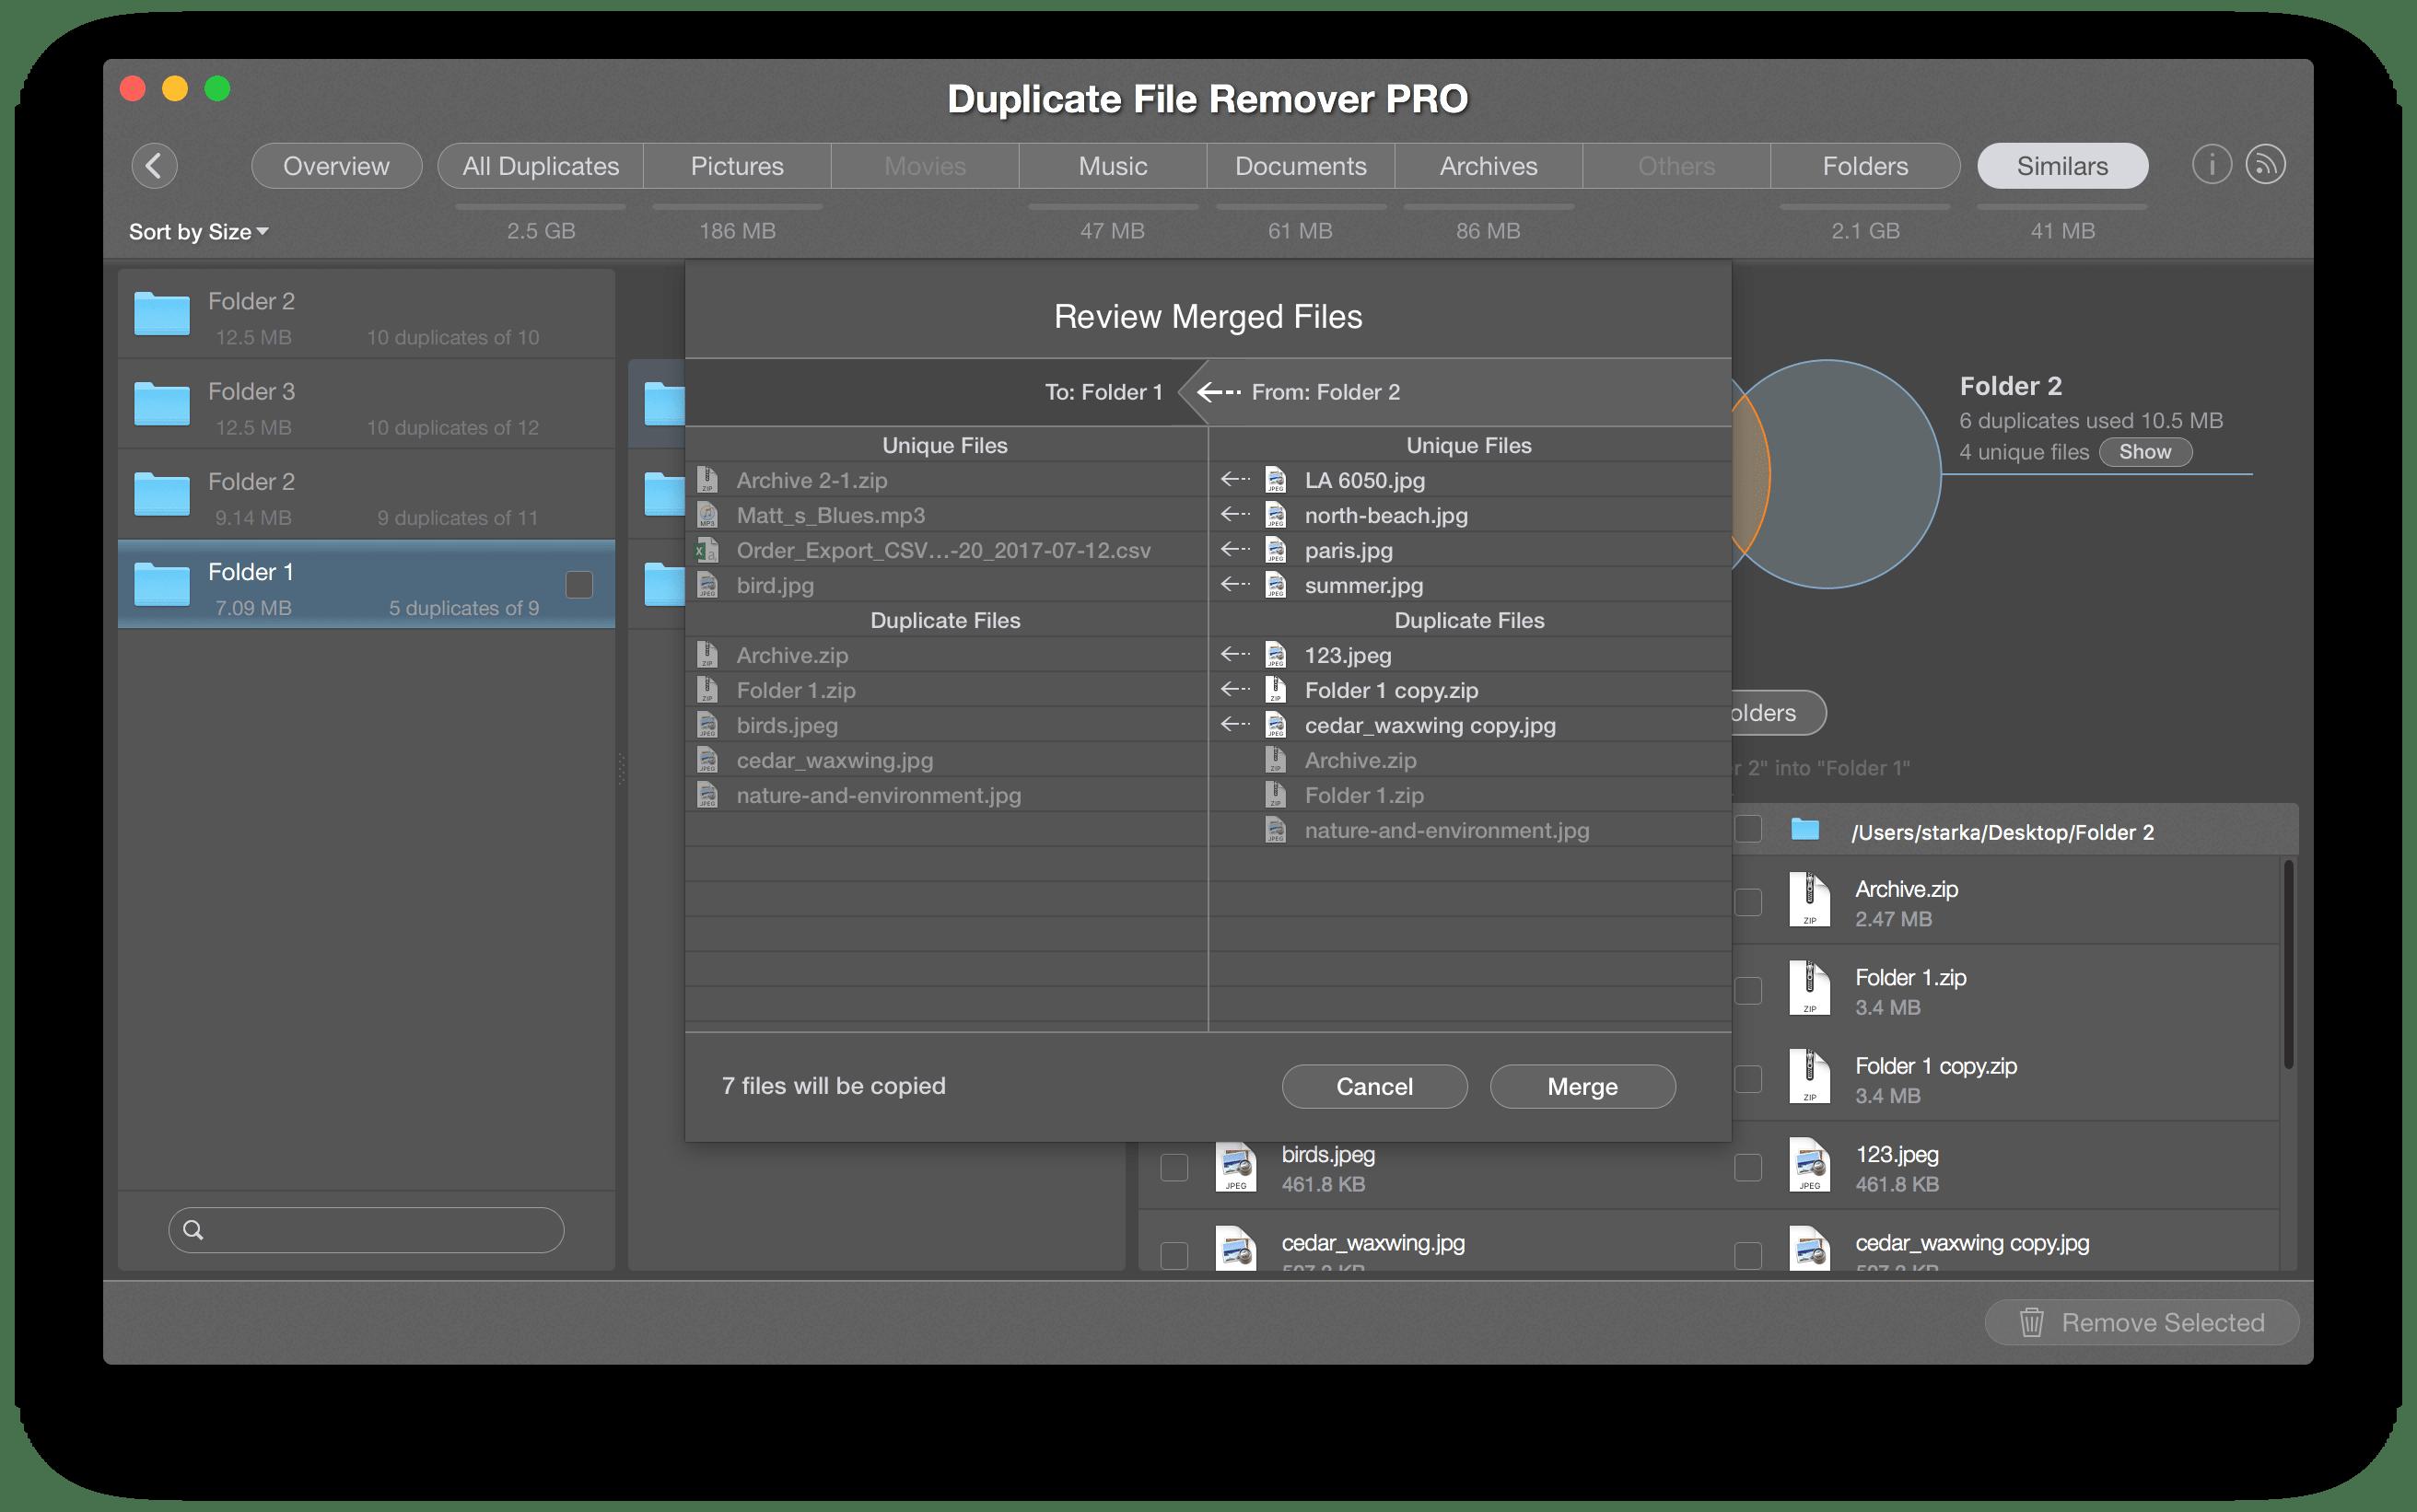 merge folders - complete